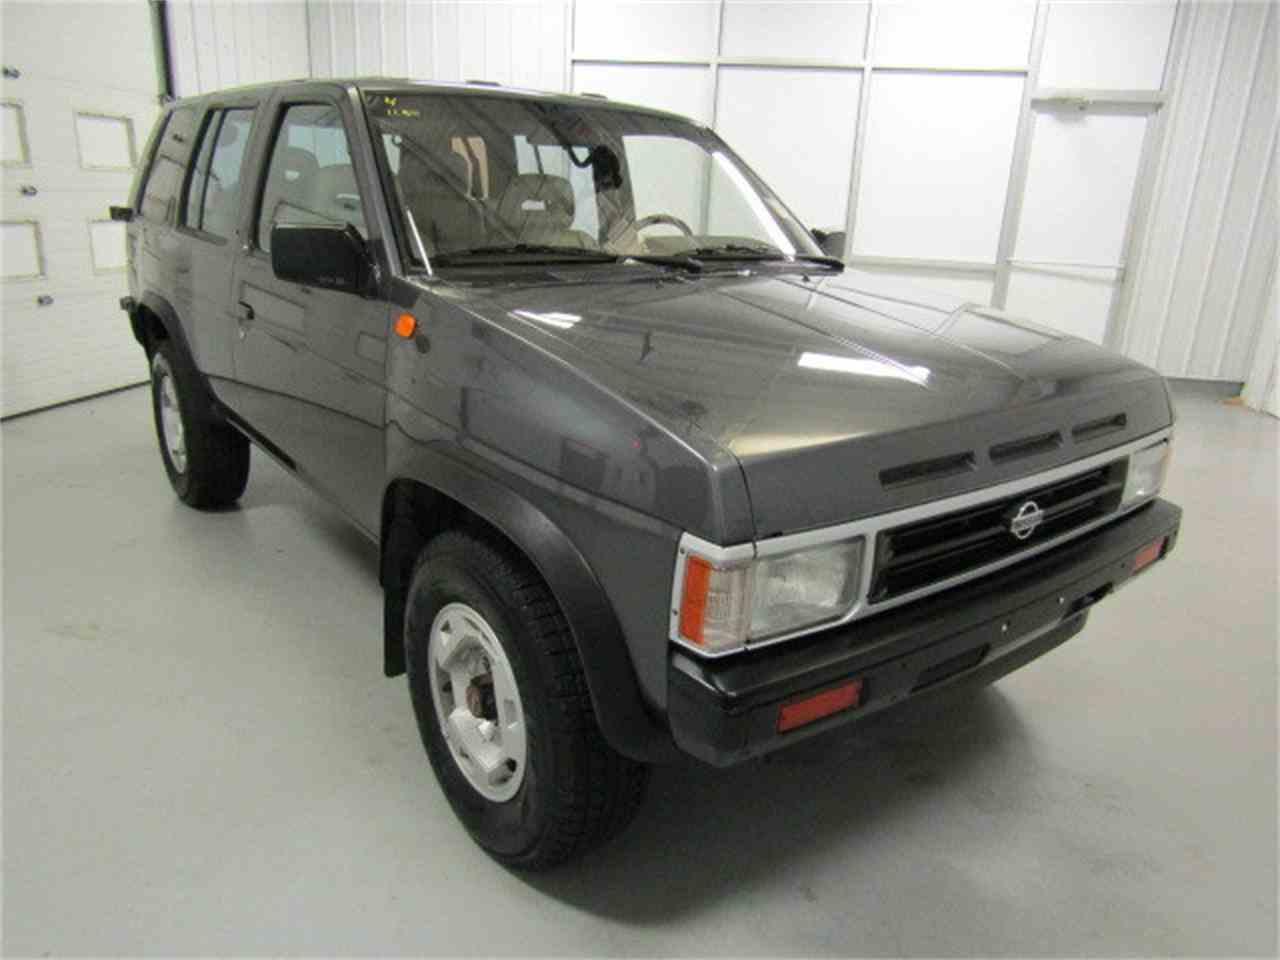 1991 Nissan Pathfinder for Sale - CC-1003207